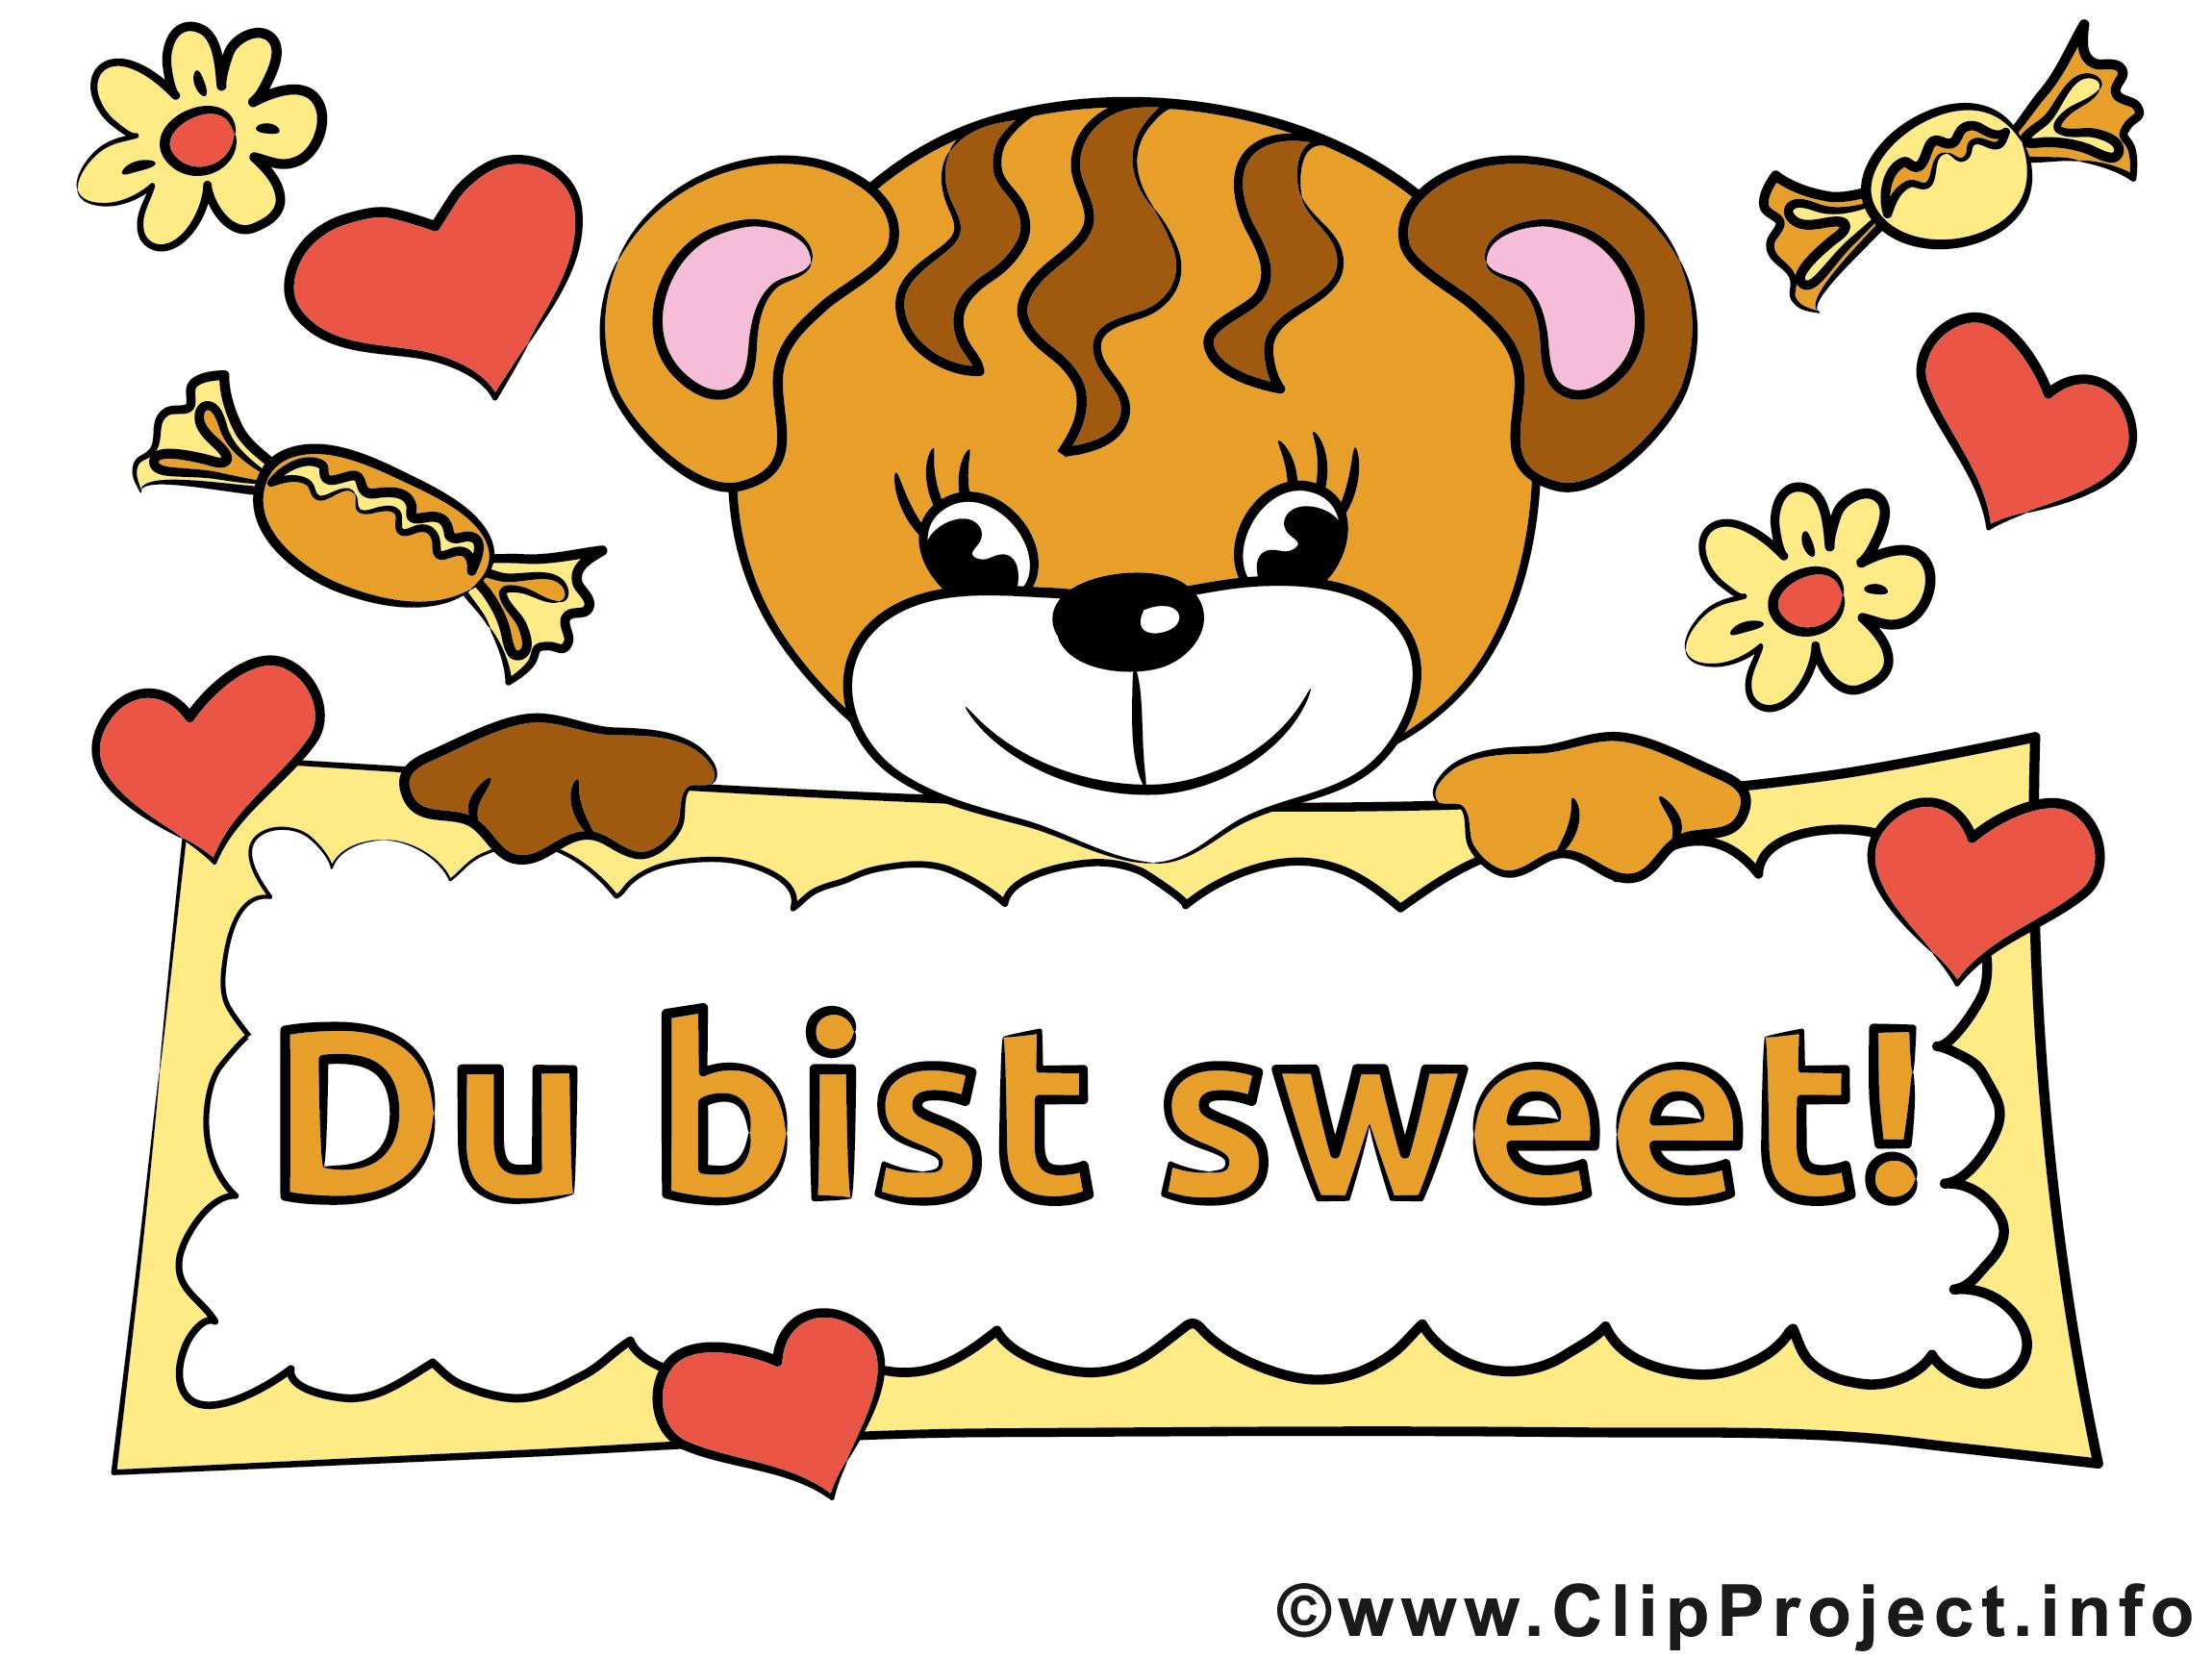 GB Pic - Du bist sweet